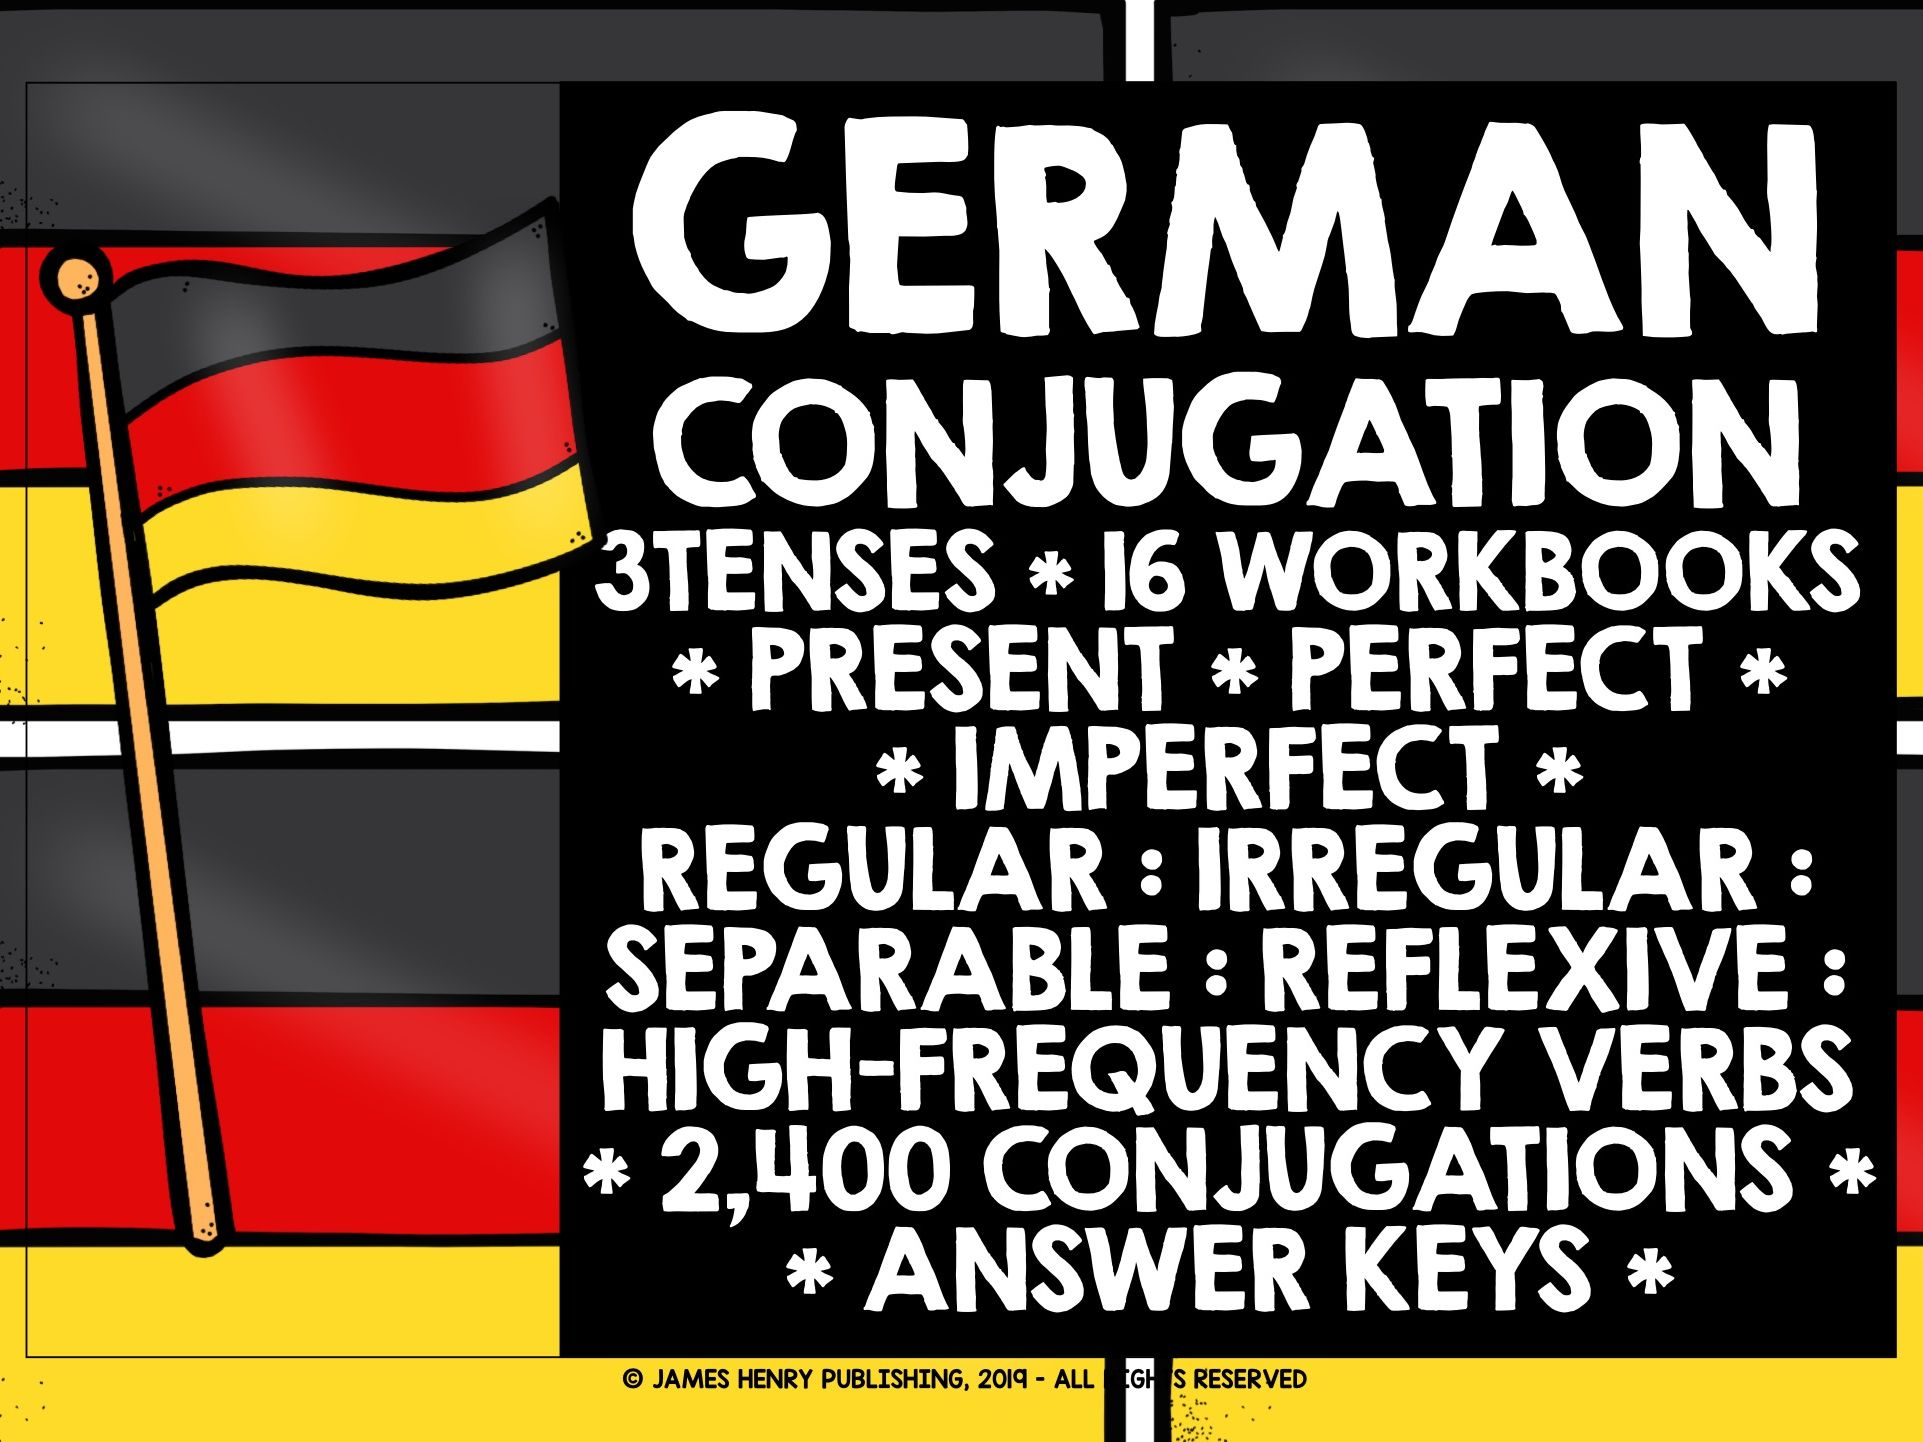 GERMAN GCSE VERBS CONJUGATION PRESENT, PERFECT, IMPERFECT TENSES